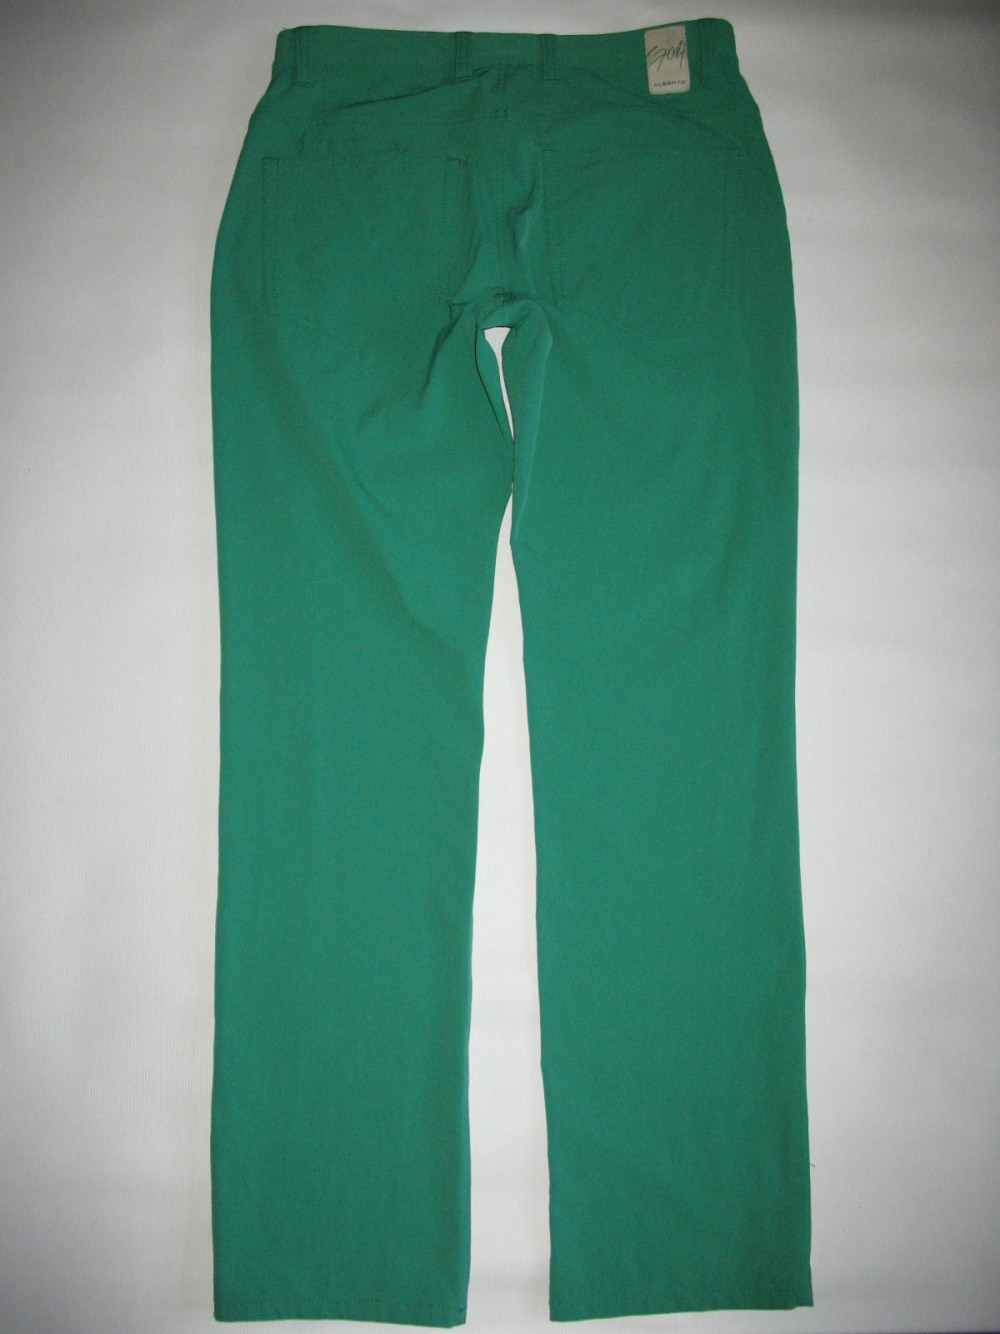 Штаны ALBERTO pro 3XDRY cooler pants (размер 48/M) - 3